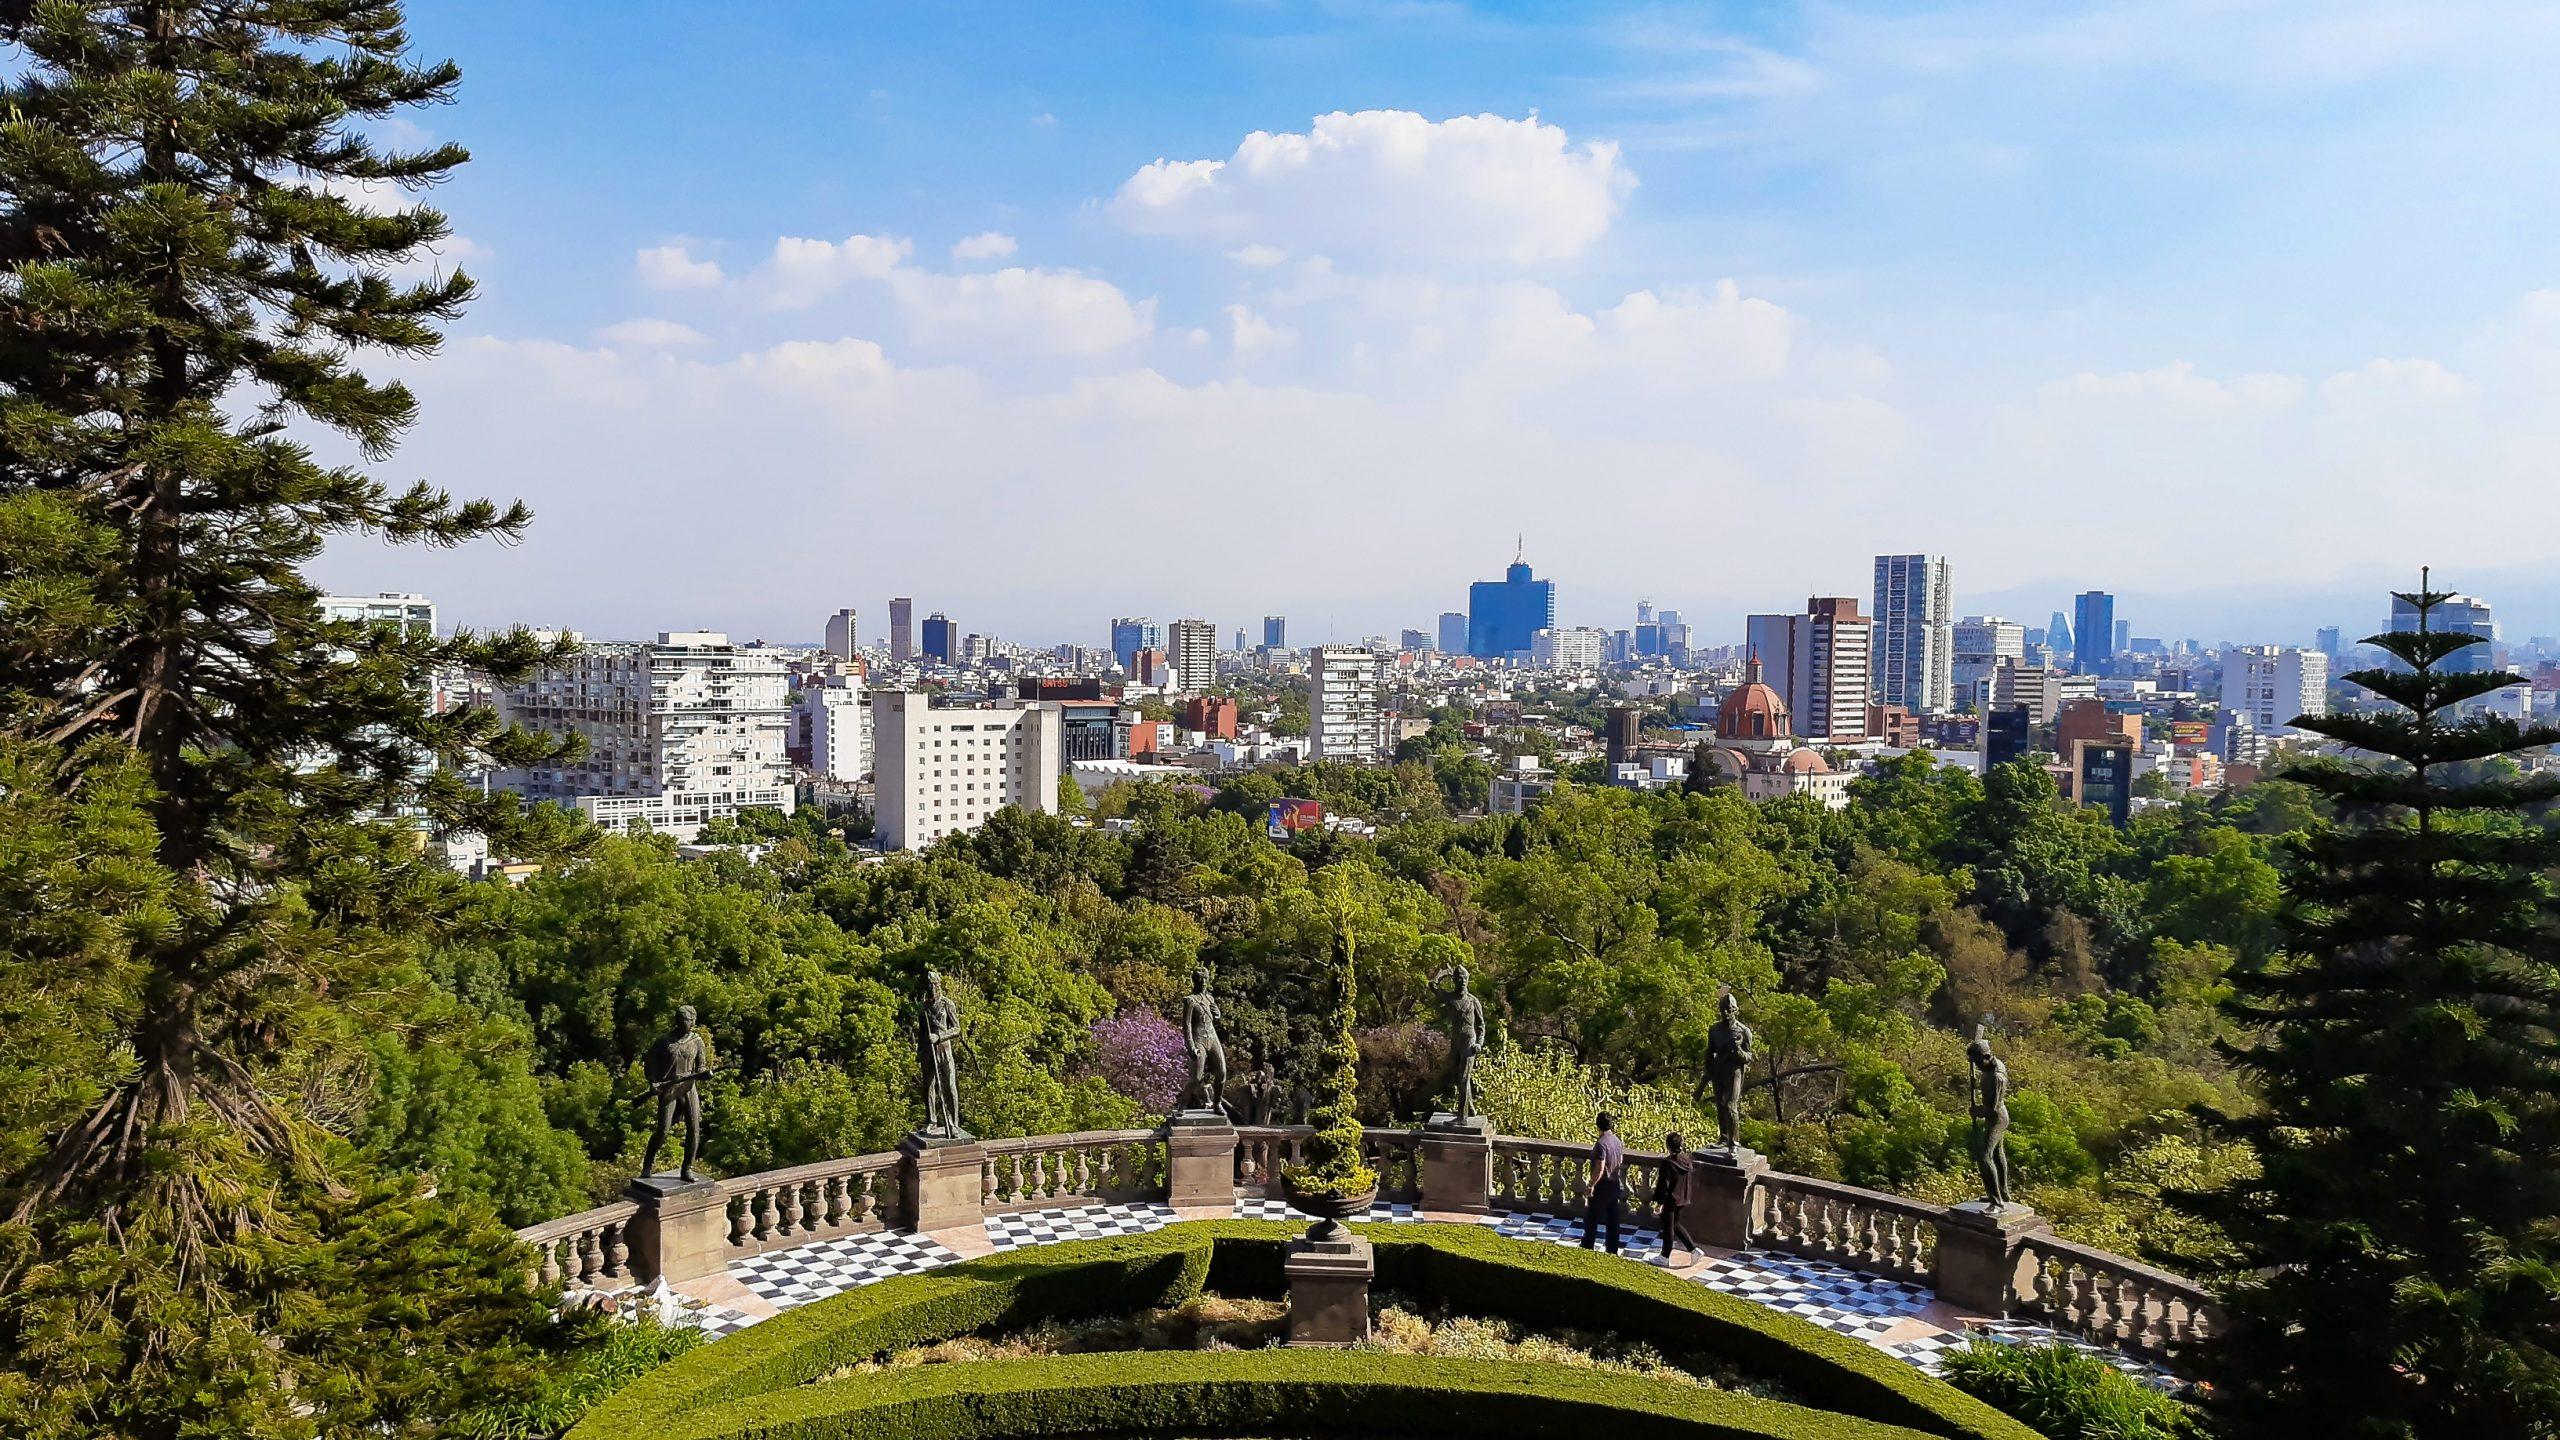 chapultepec scaled - Meksiko'yu 10 Mekanla Tanımak